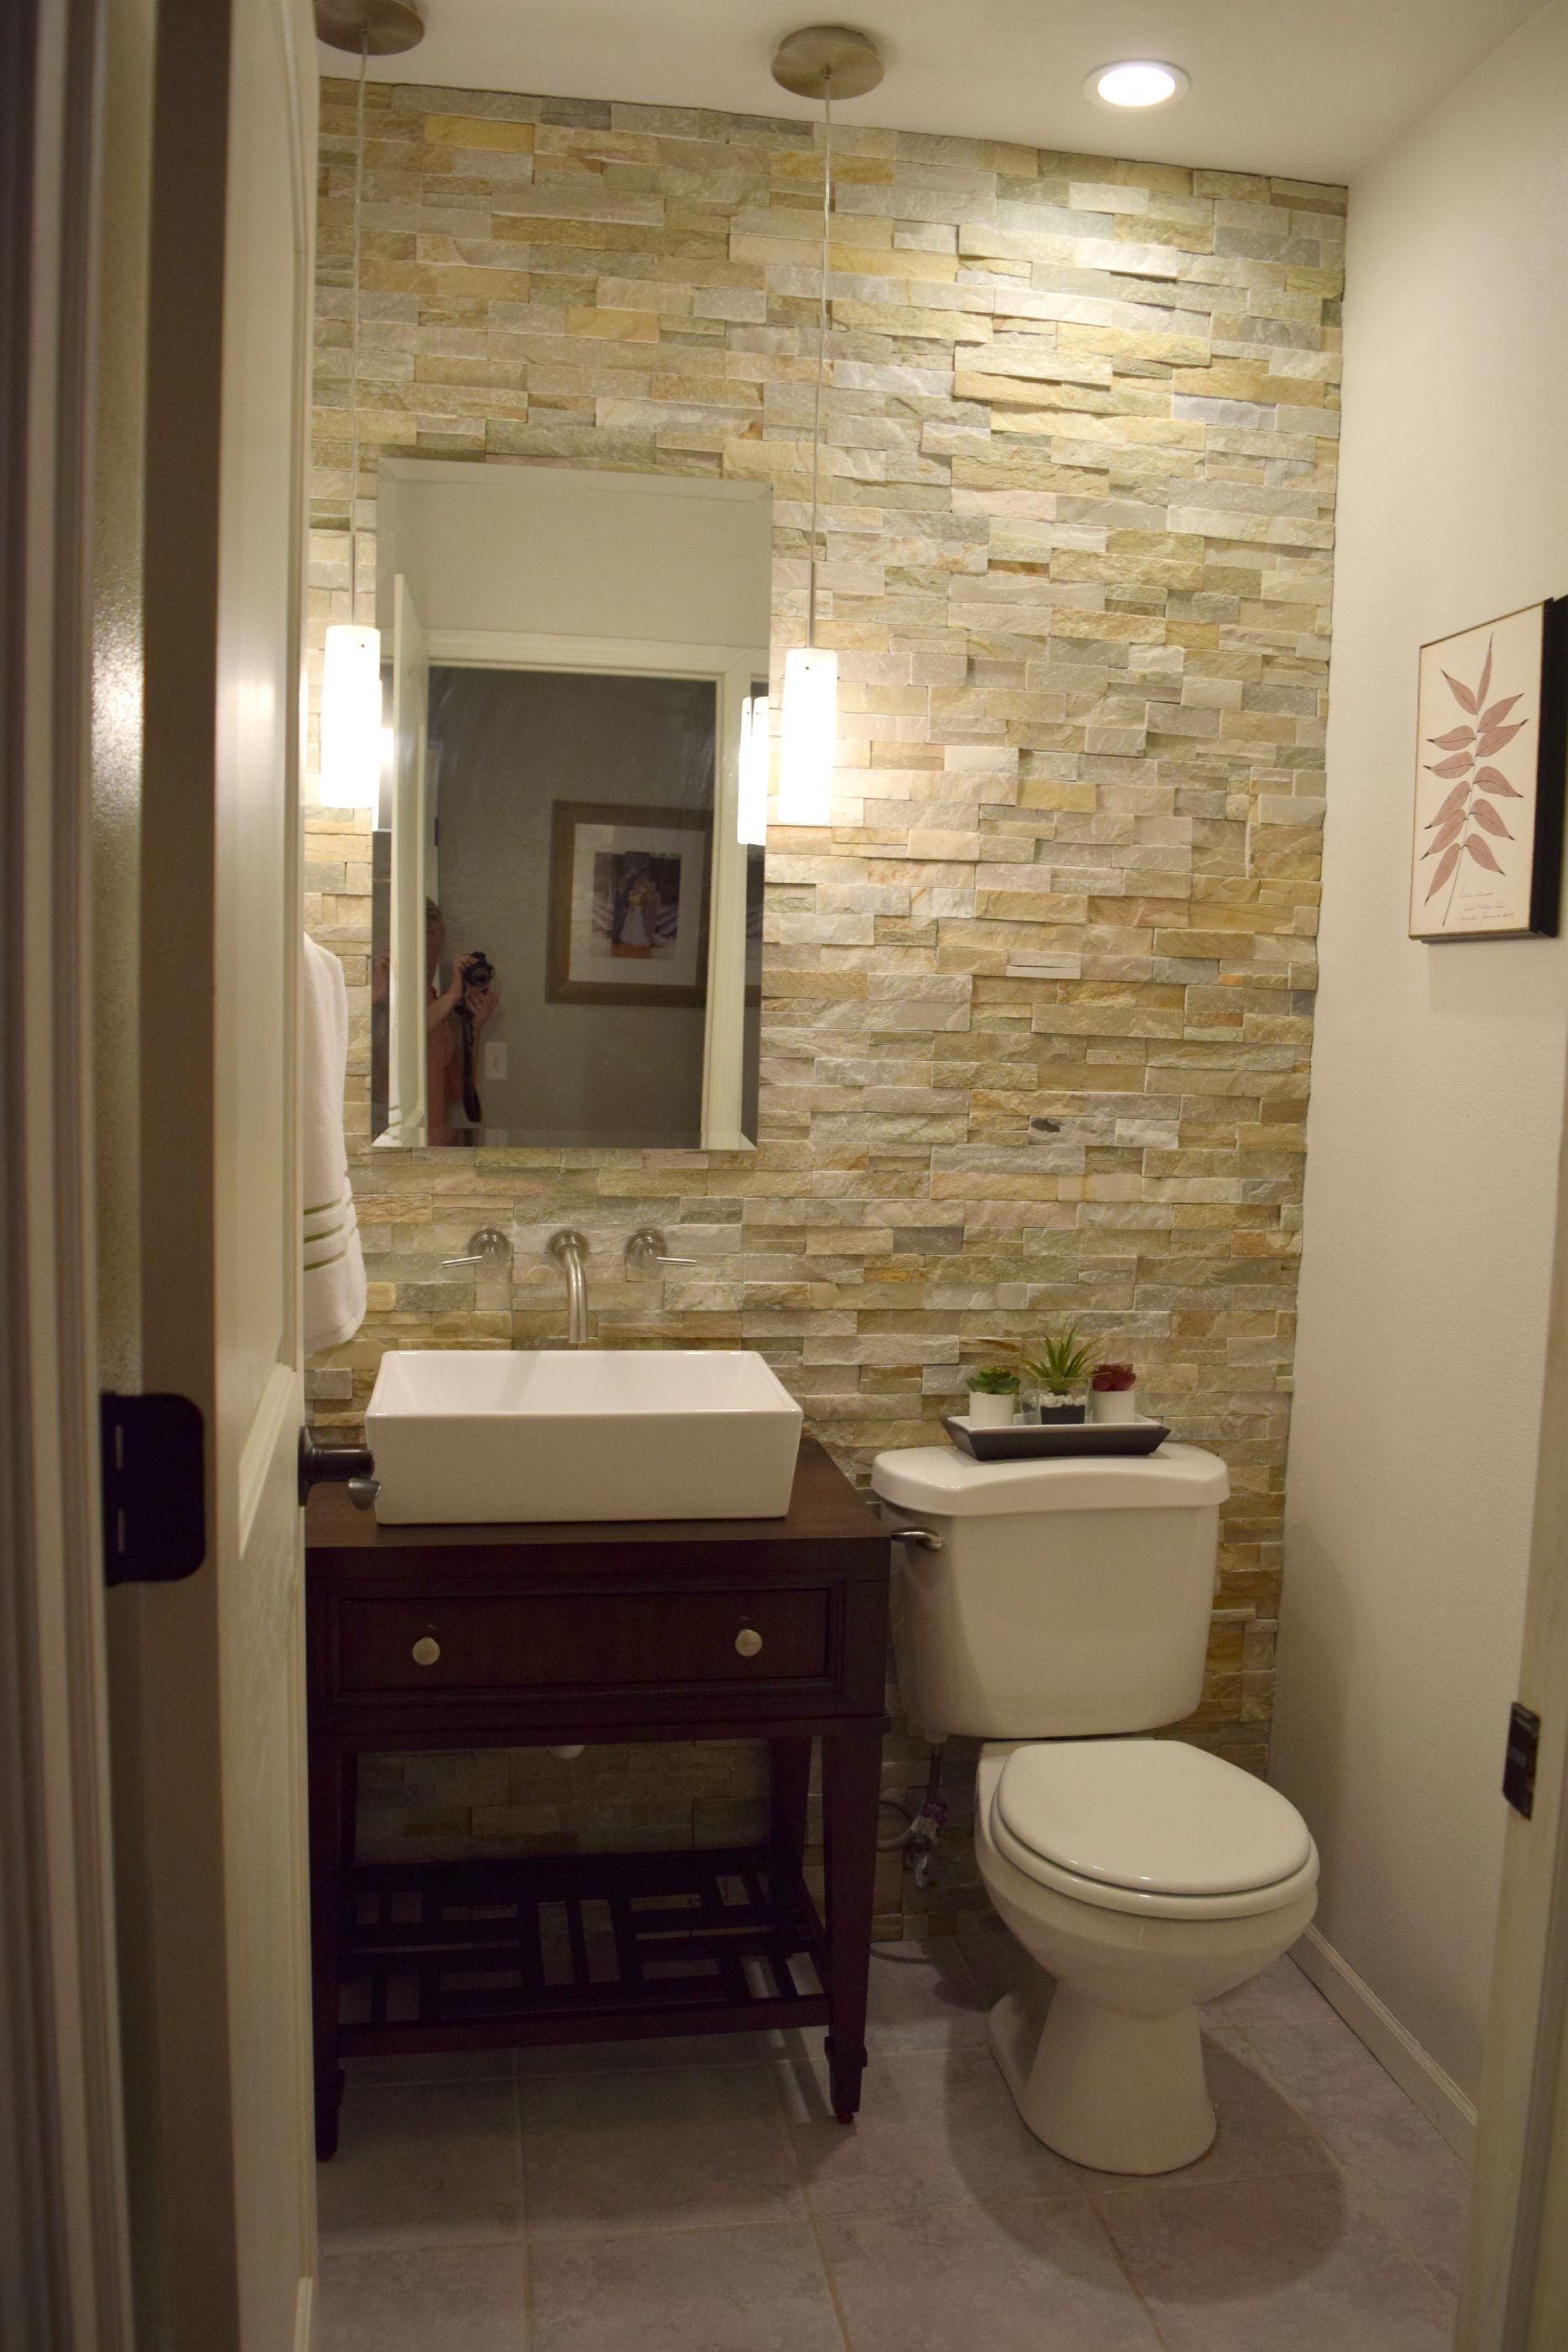 26 Half Bathroom Ideas and Design For Upgrade Your House | Baum und ...